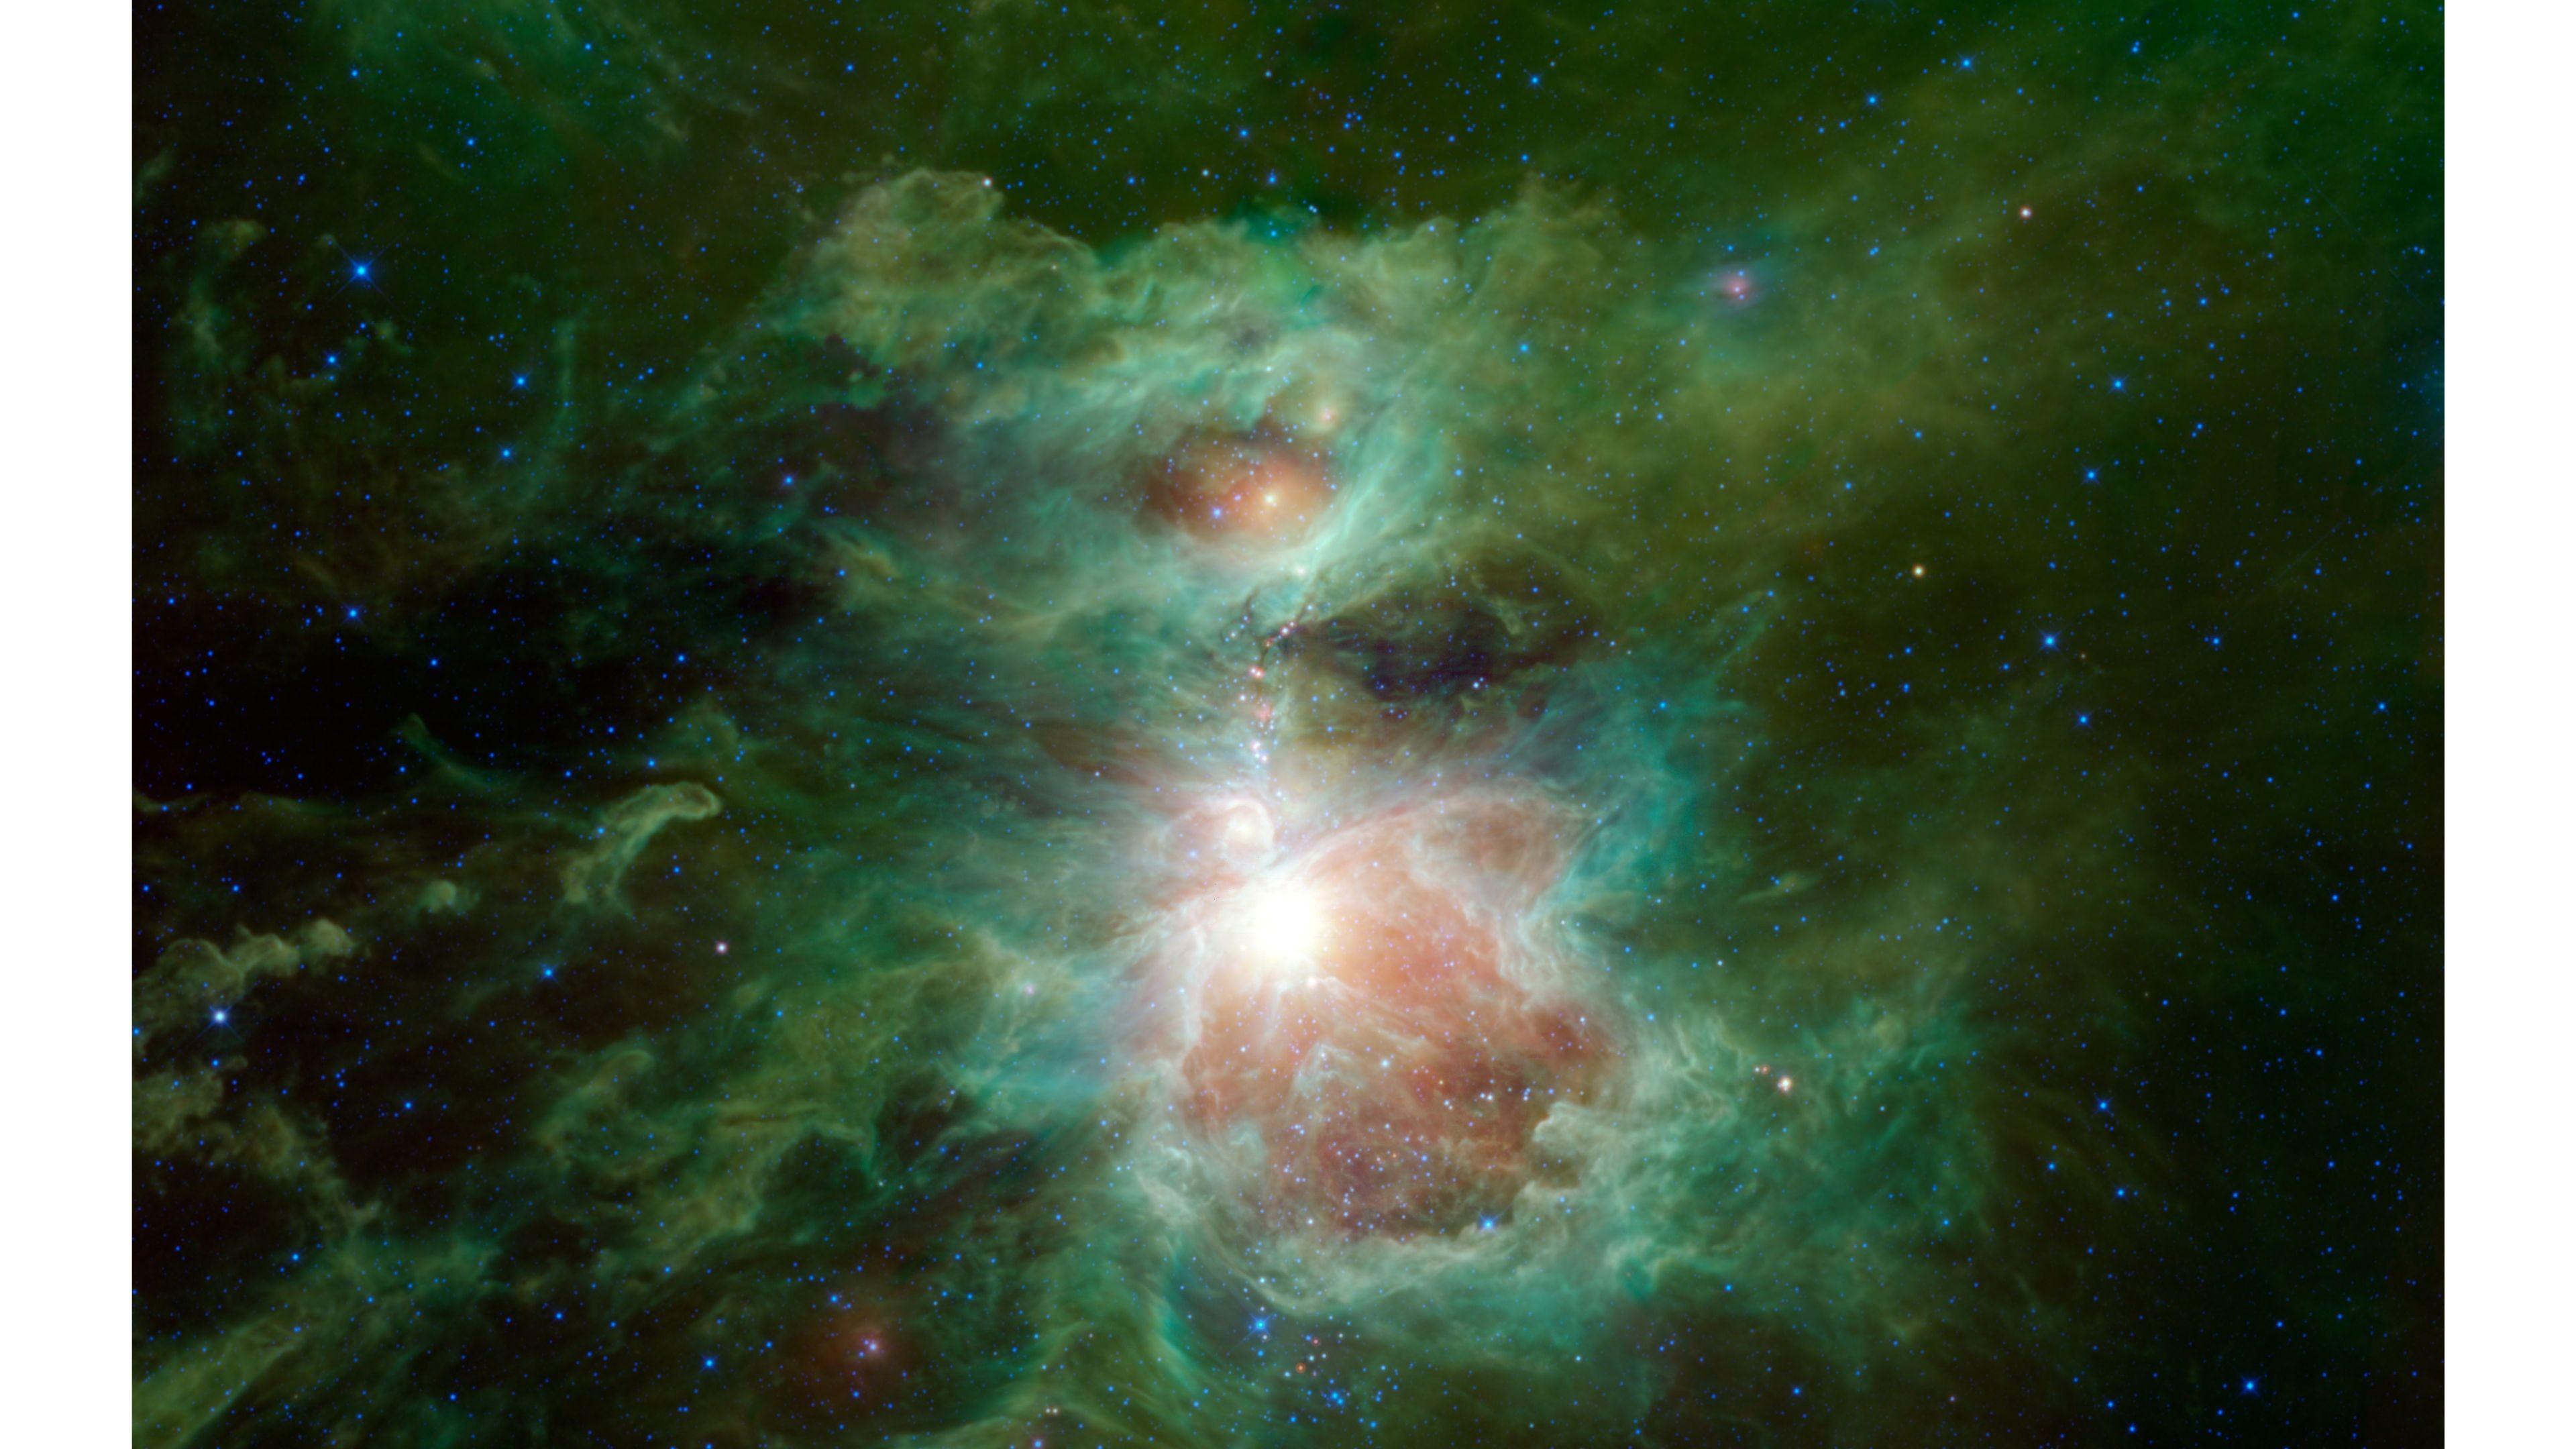 space wallpaper 4k,nature,nebula,astronomical object,green,sky